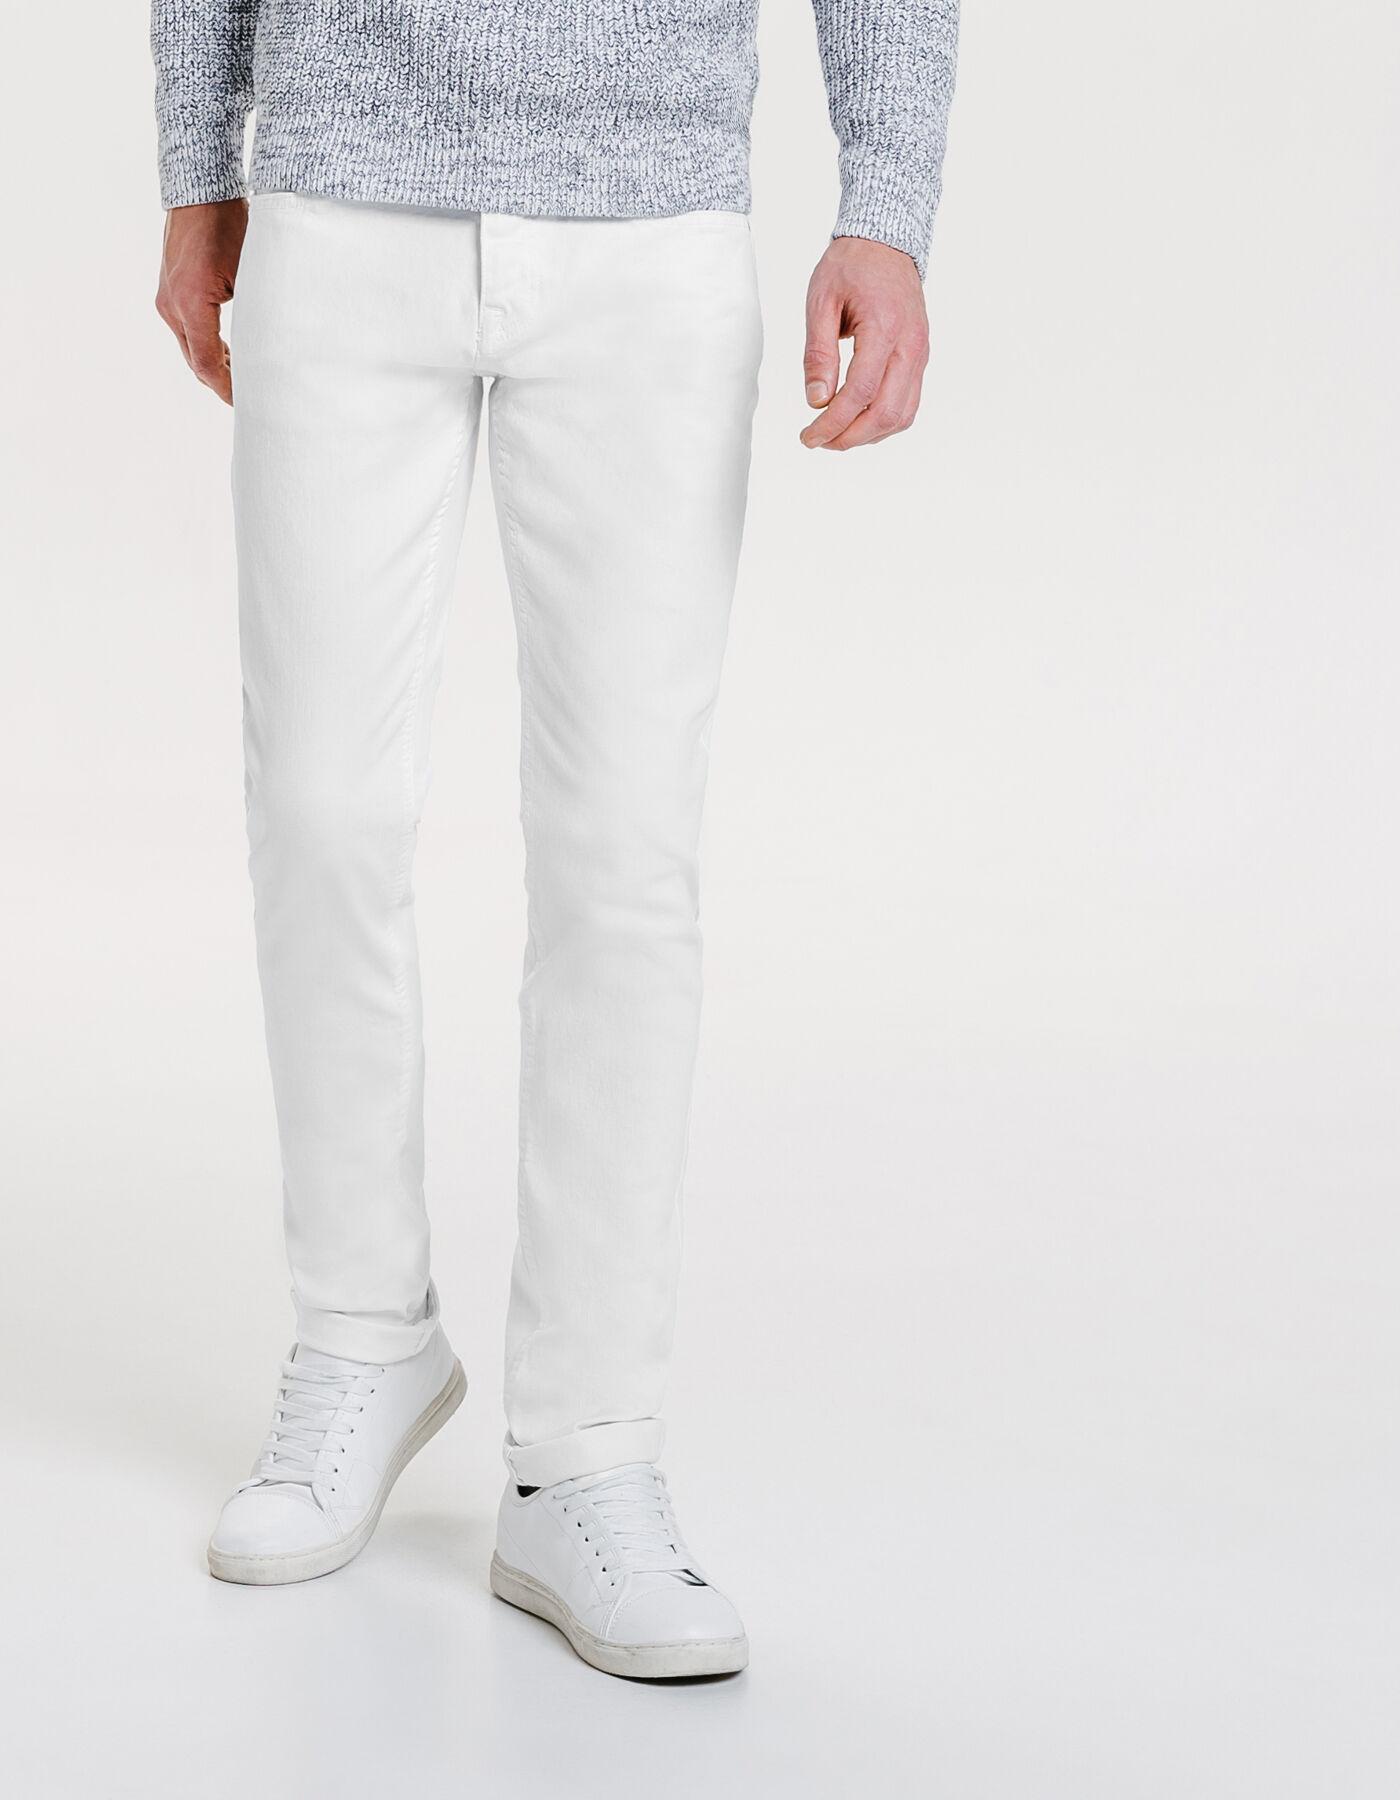 pantalon 5 poches slim blanc homme jules. Black Bedroom Furniture Sets. Home Design Ideas